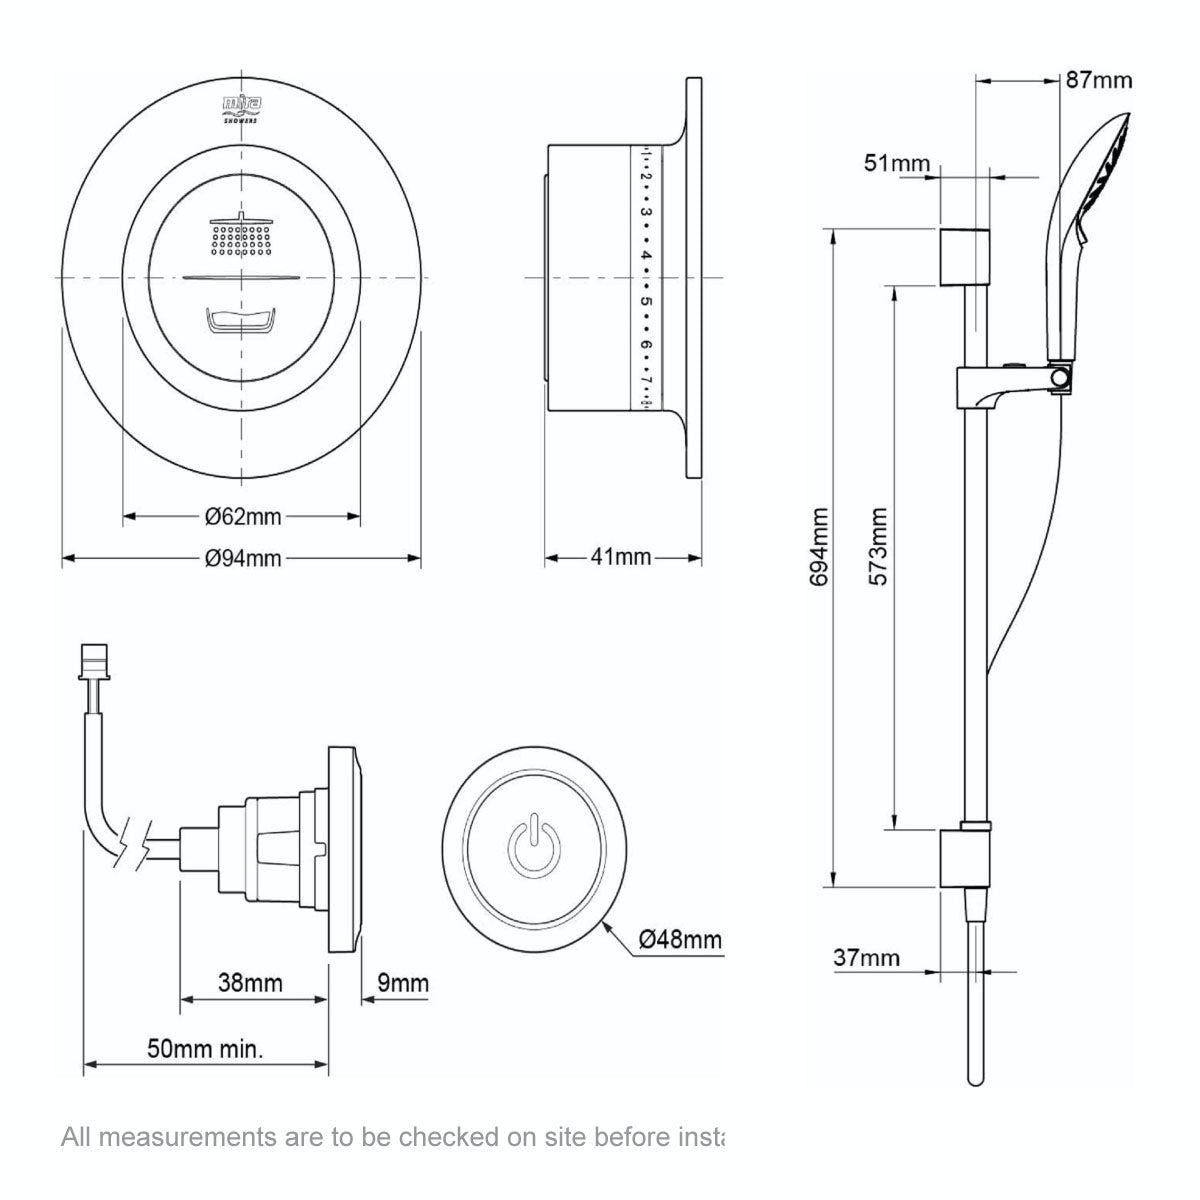 Dimensions for Mira Mode rear fed digital shower standard